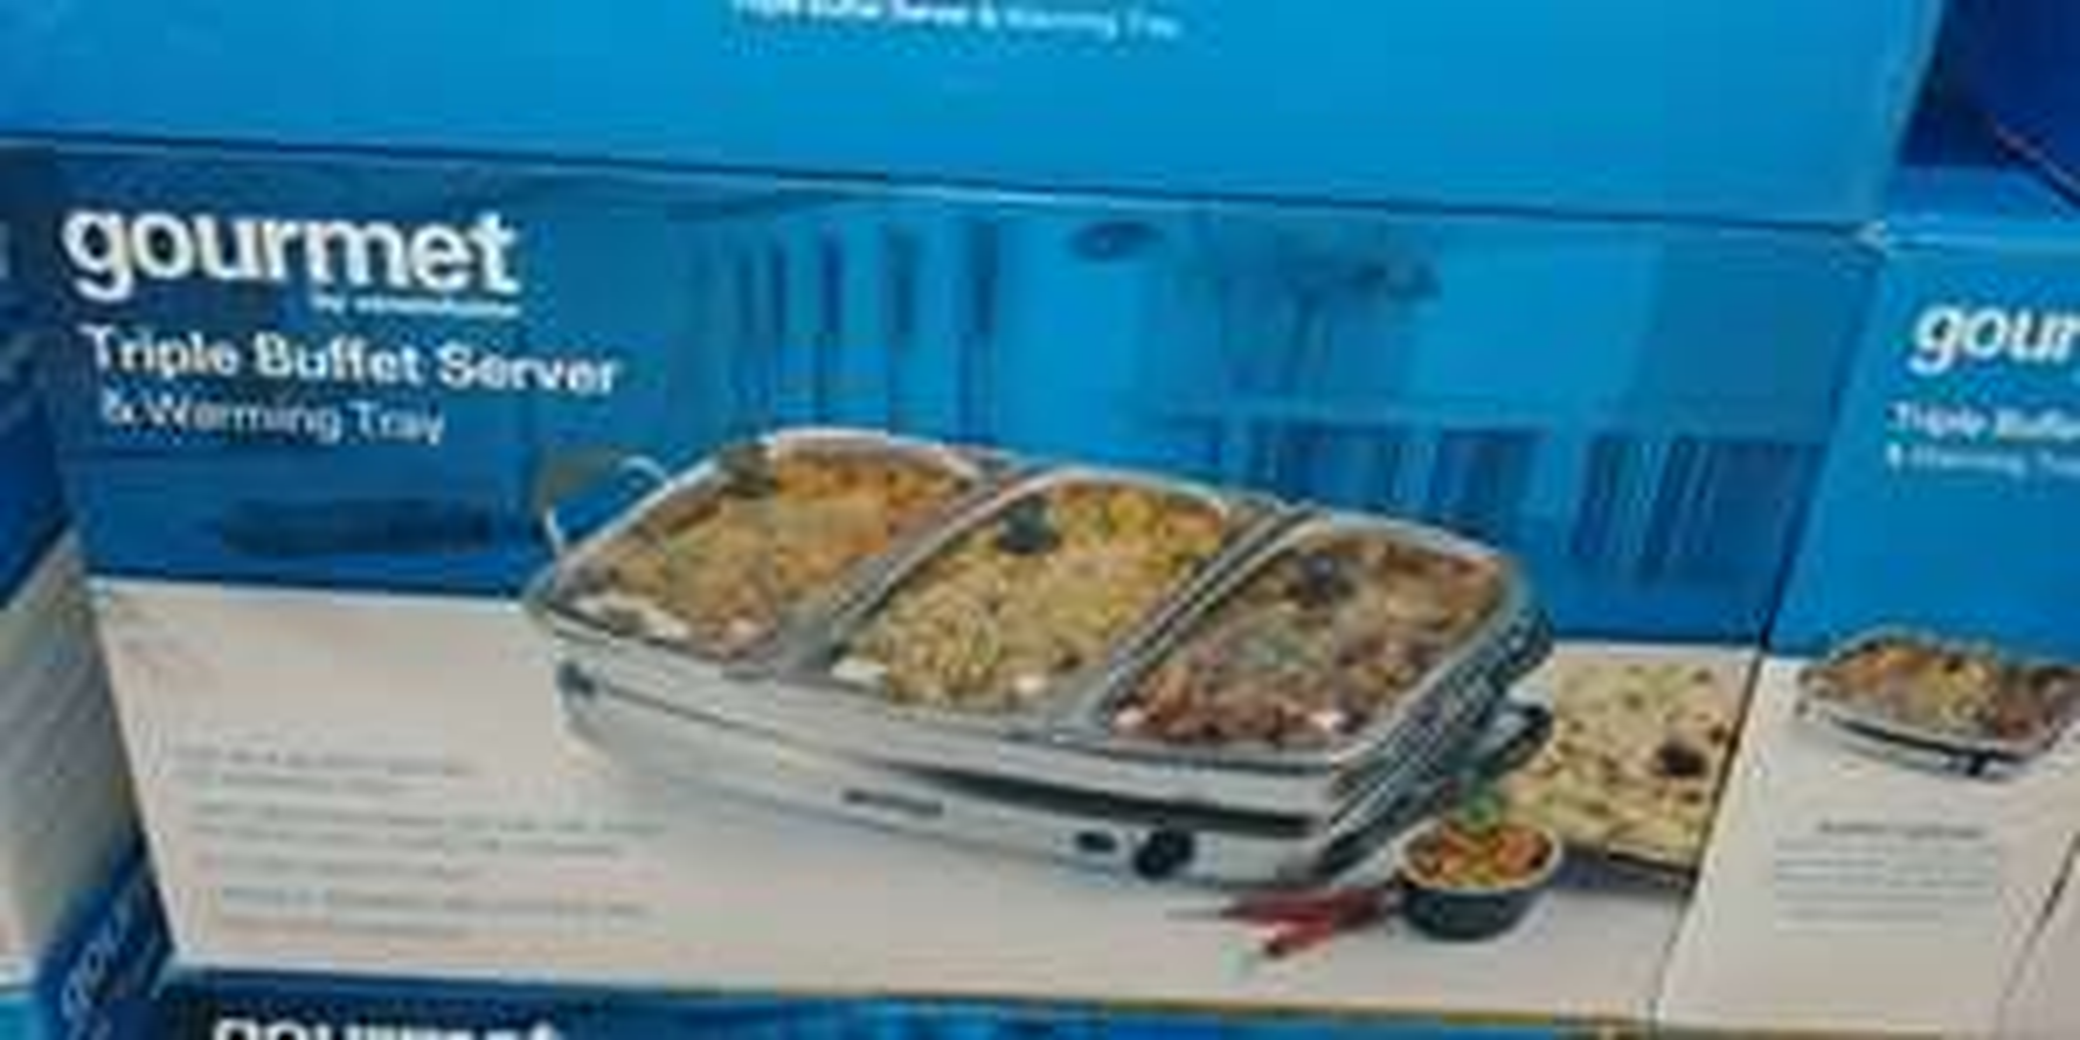 Triple Buffet server (CostCo Reading) - £35.96